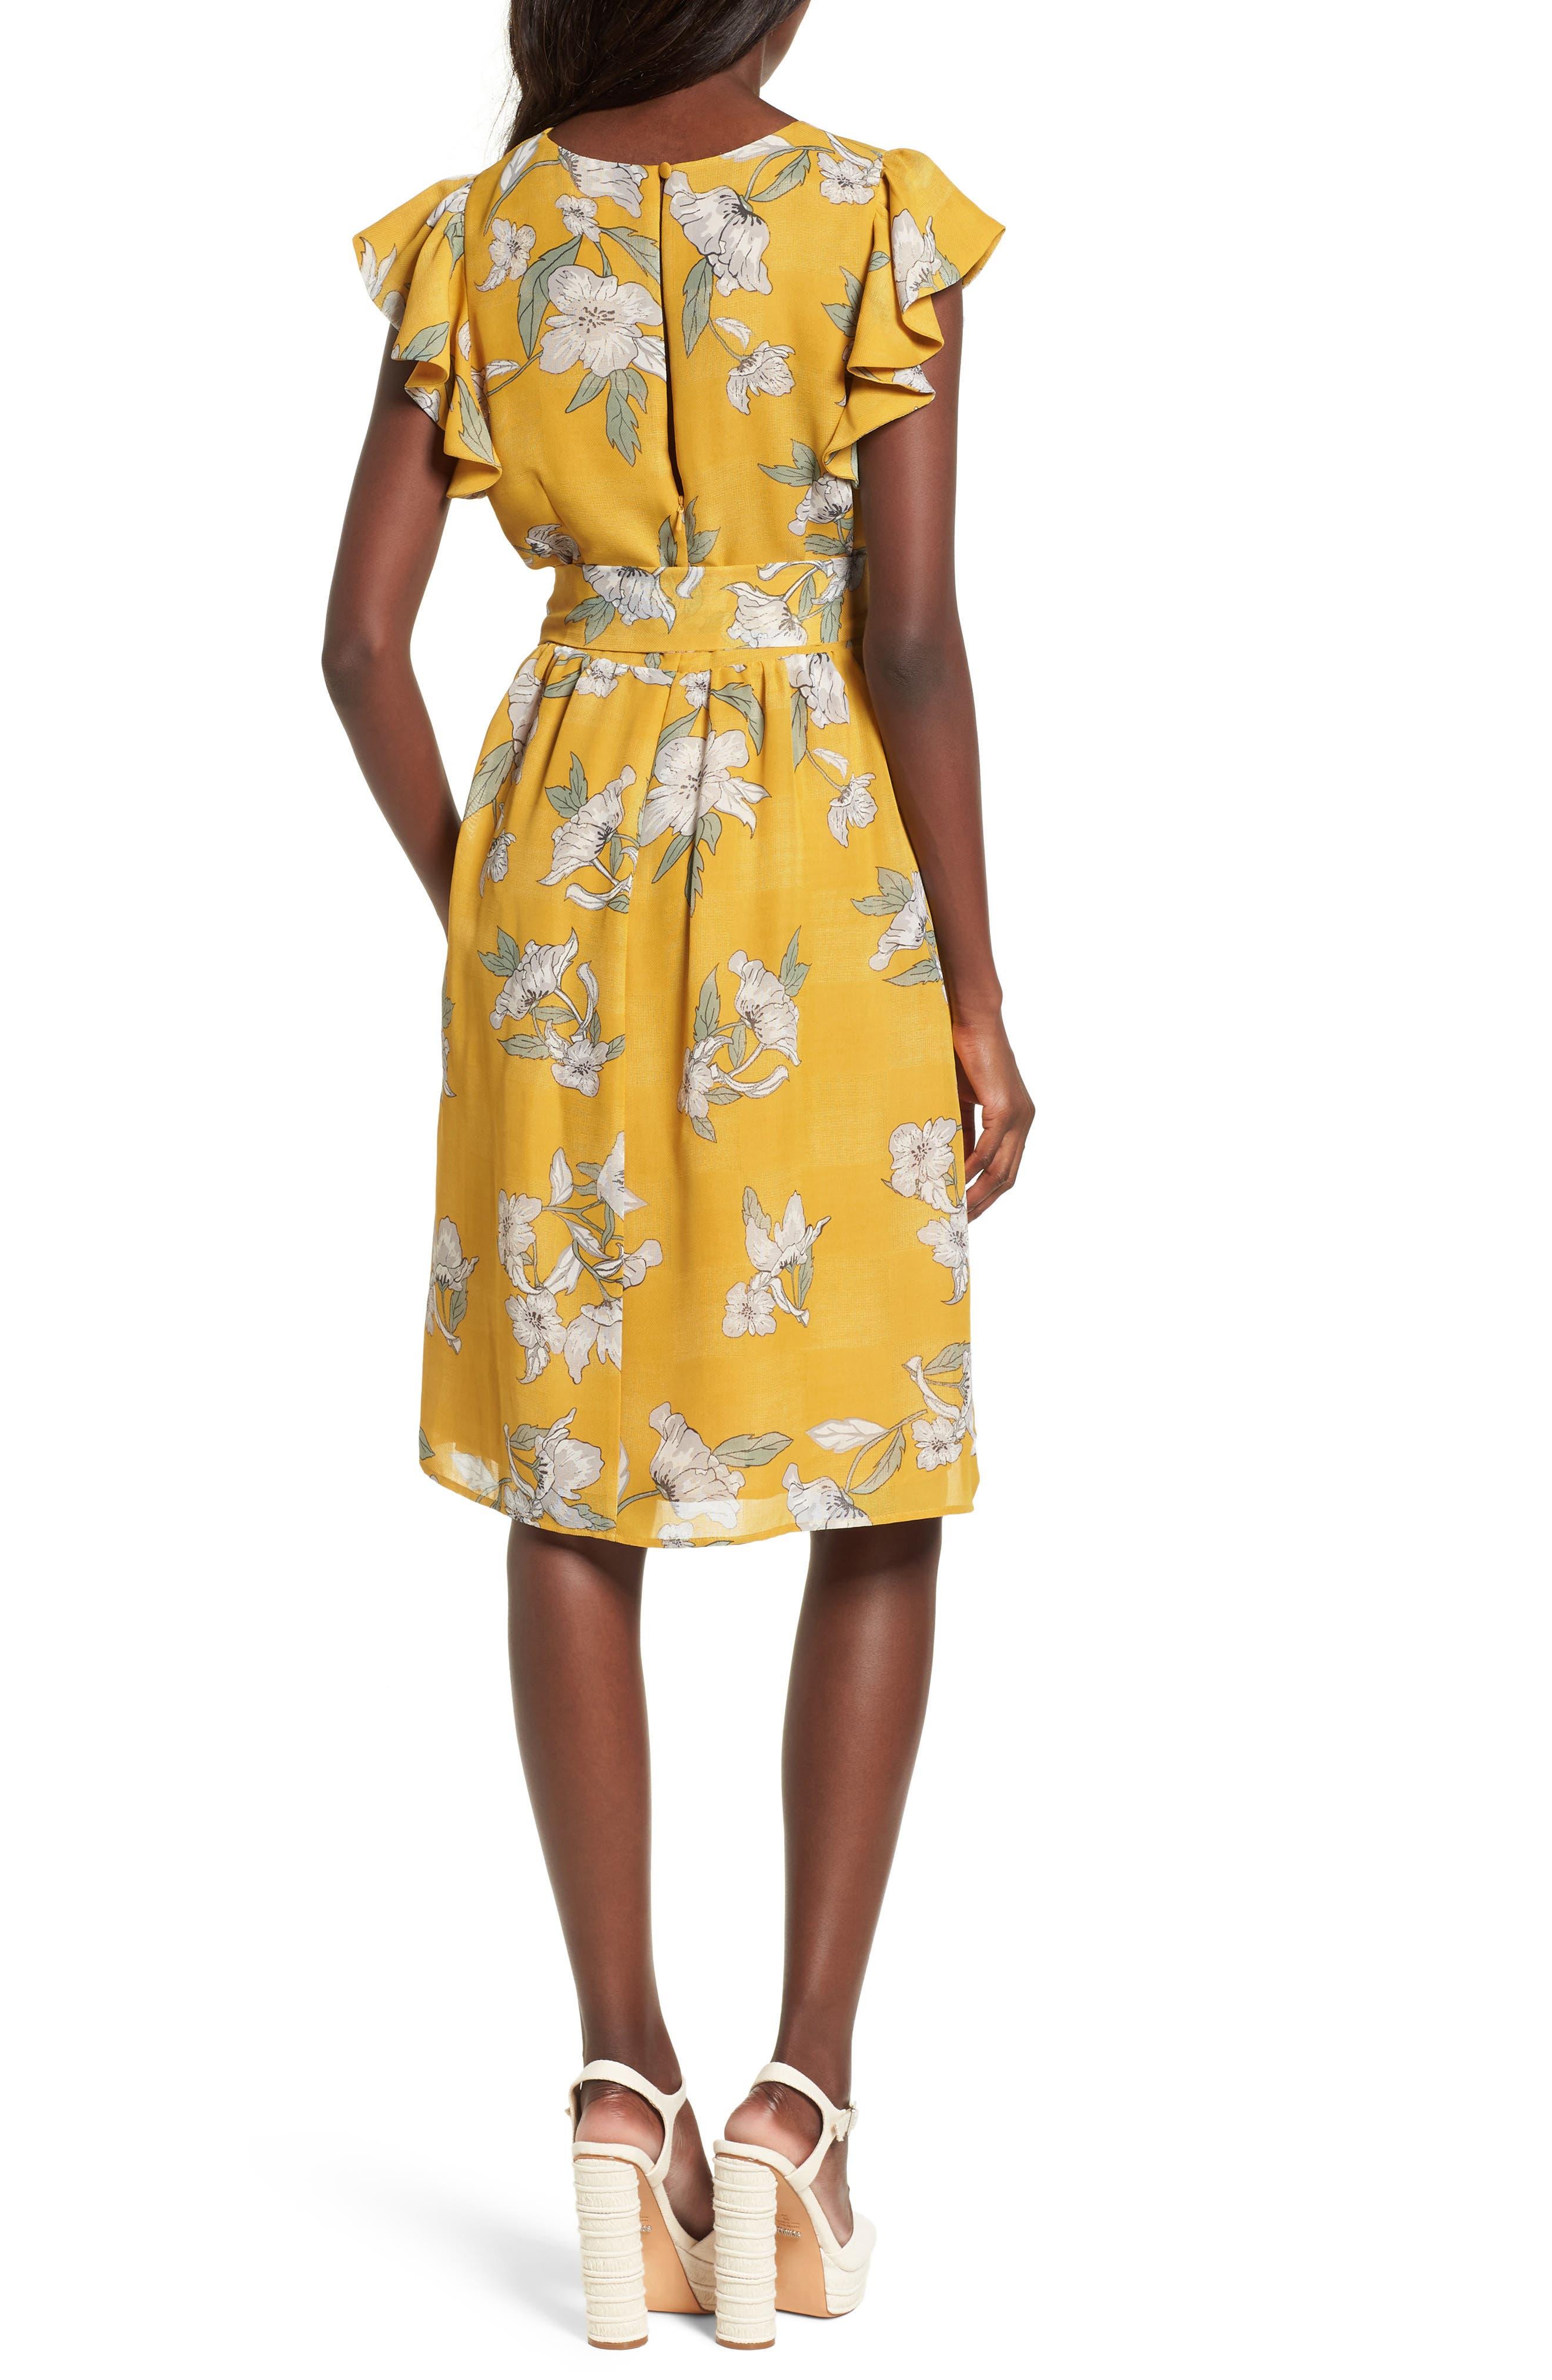 Chriselle x J.O.A. Fit & Flare Dress,                             Alternate thumbnail 2, color,                             700